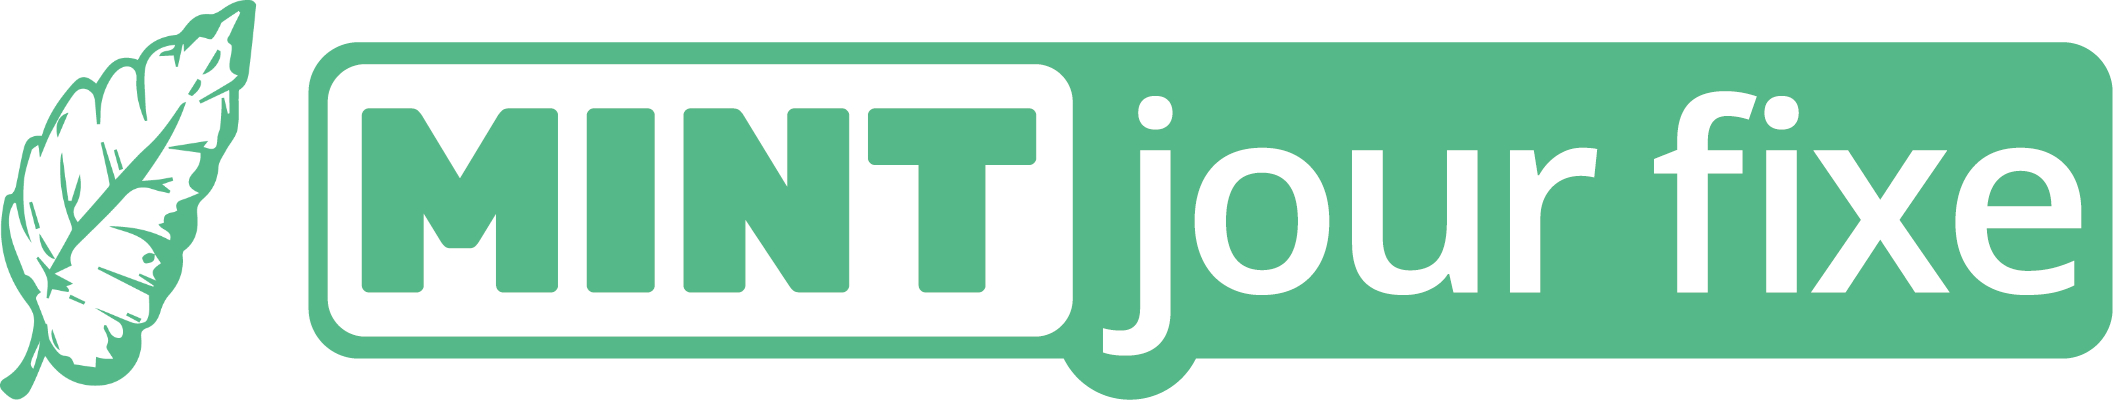 logo-mint-jf-minzblatt